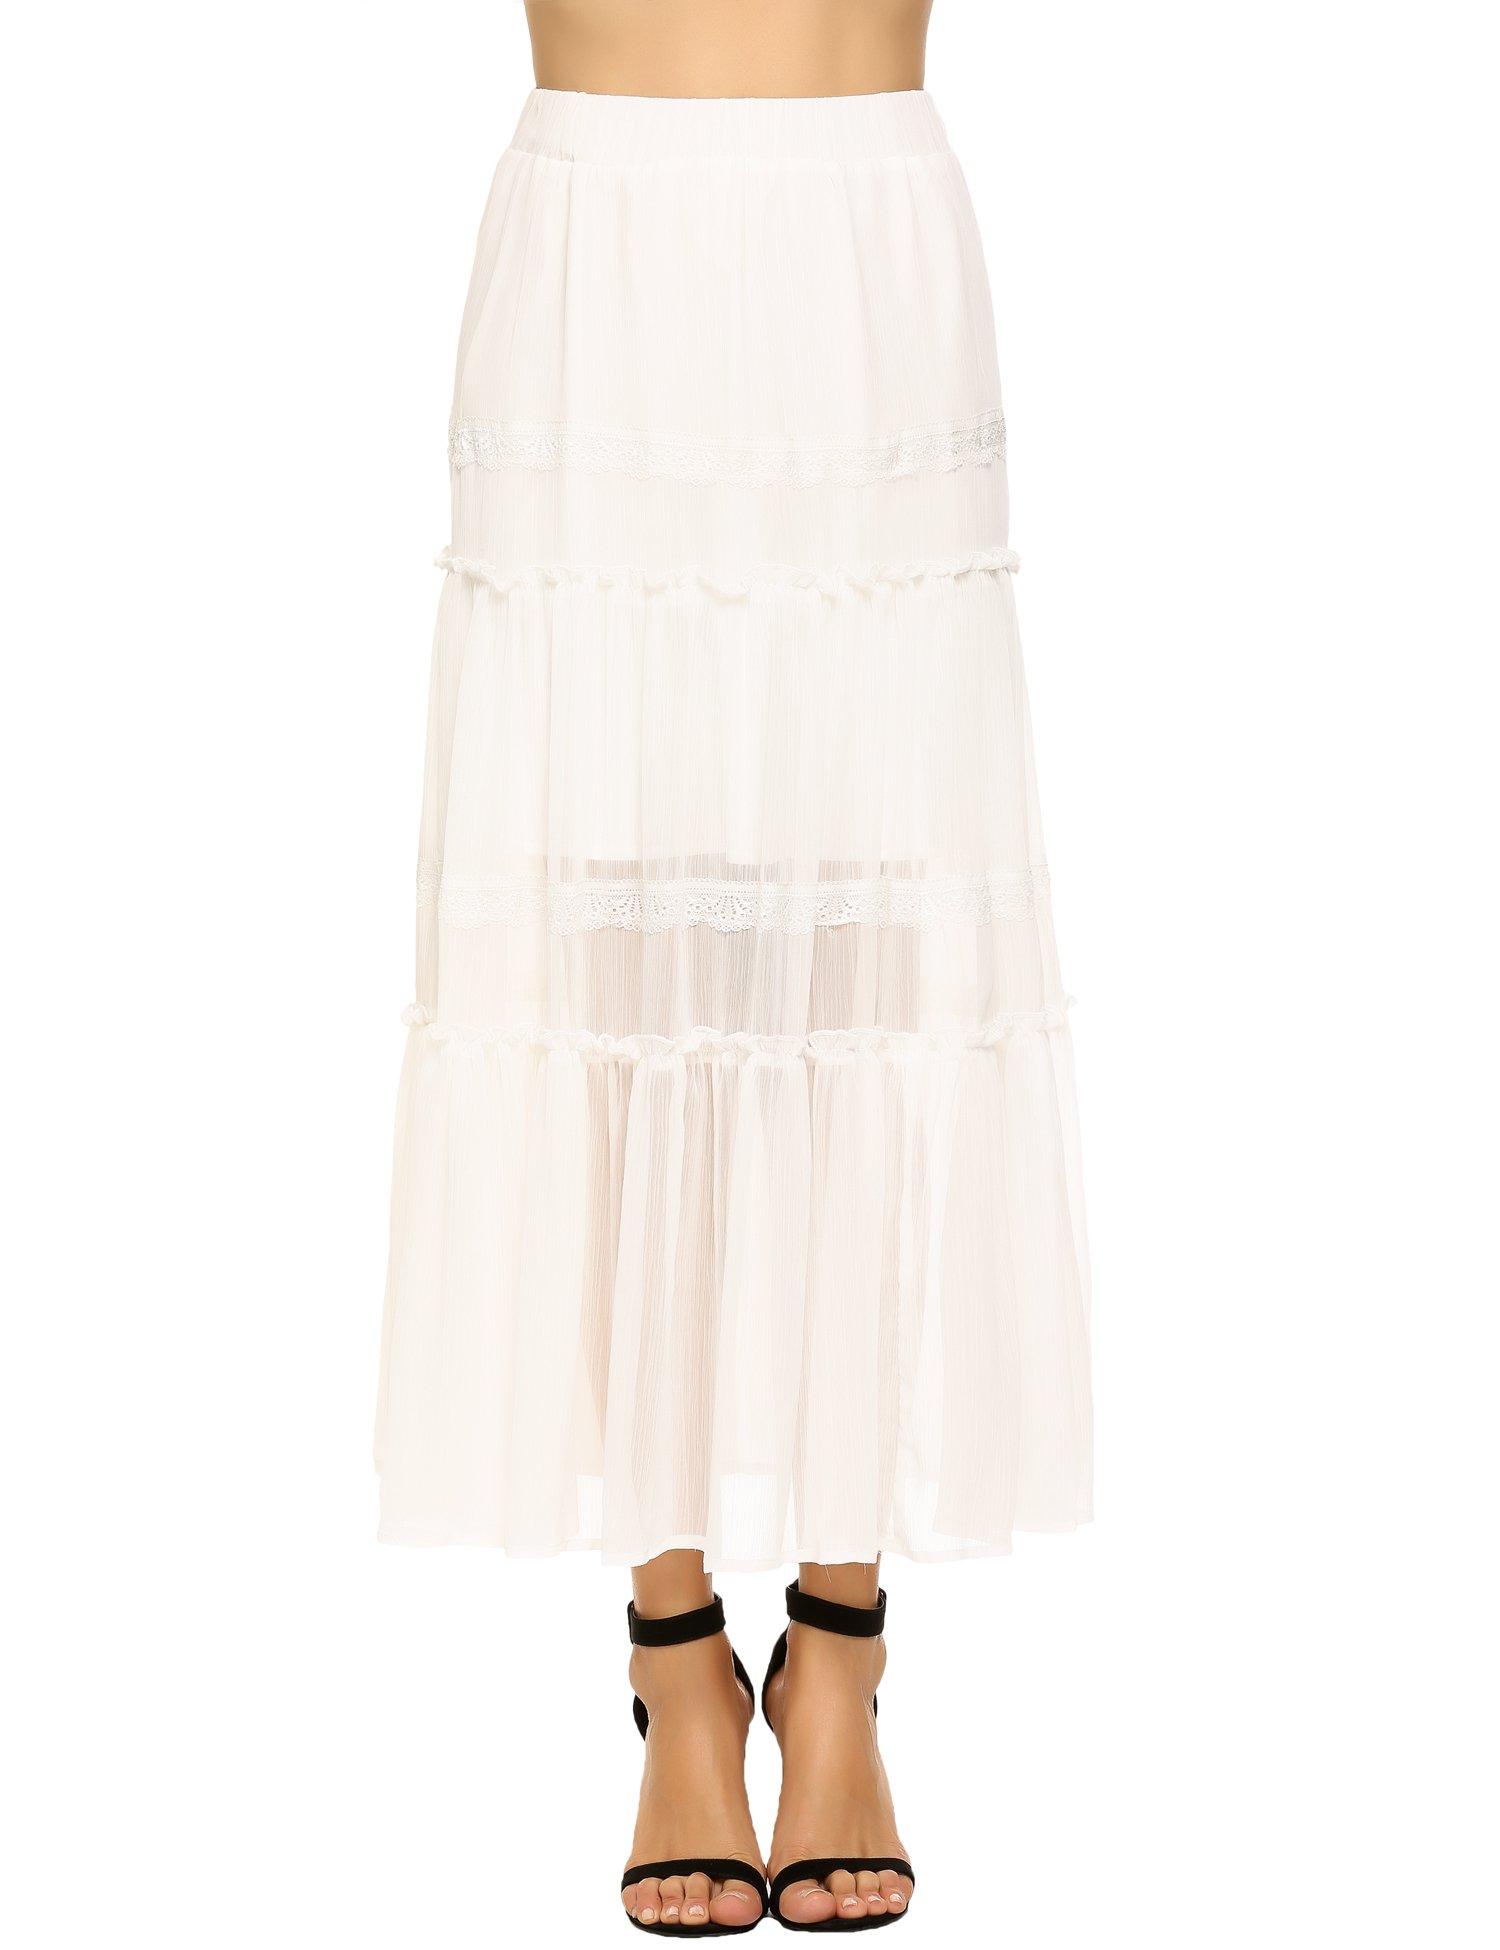 CHIGANT Women Summer Chiffon High Waist Pleated Big Hem Full/Ankle Length Beach Maxi Skirt